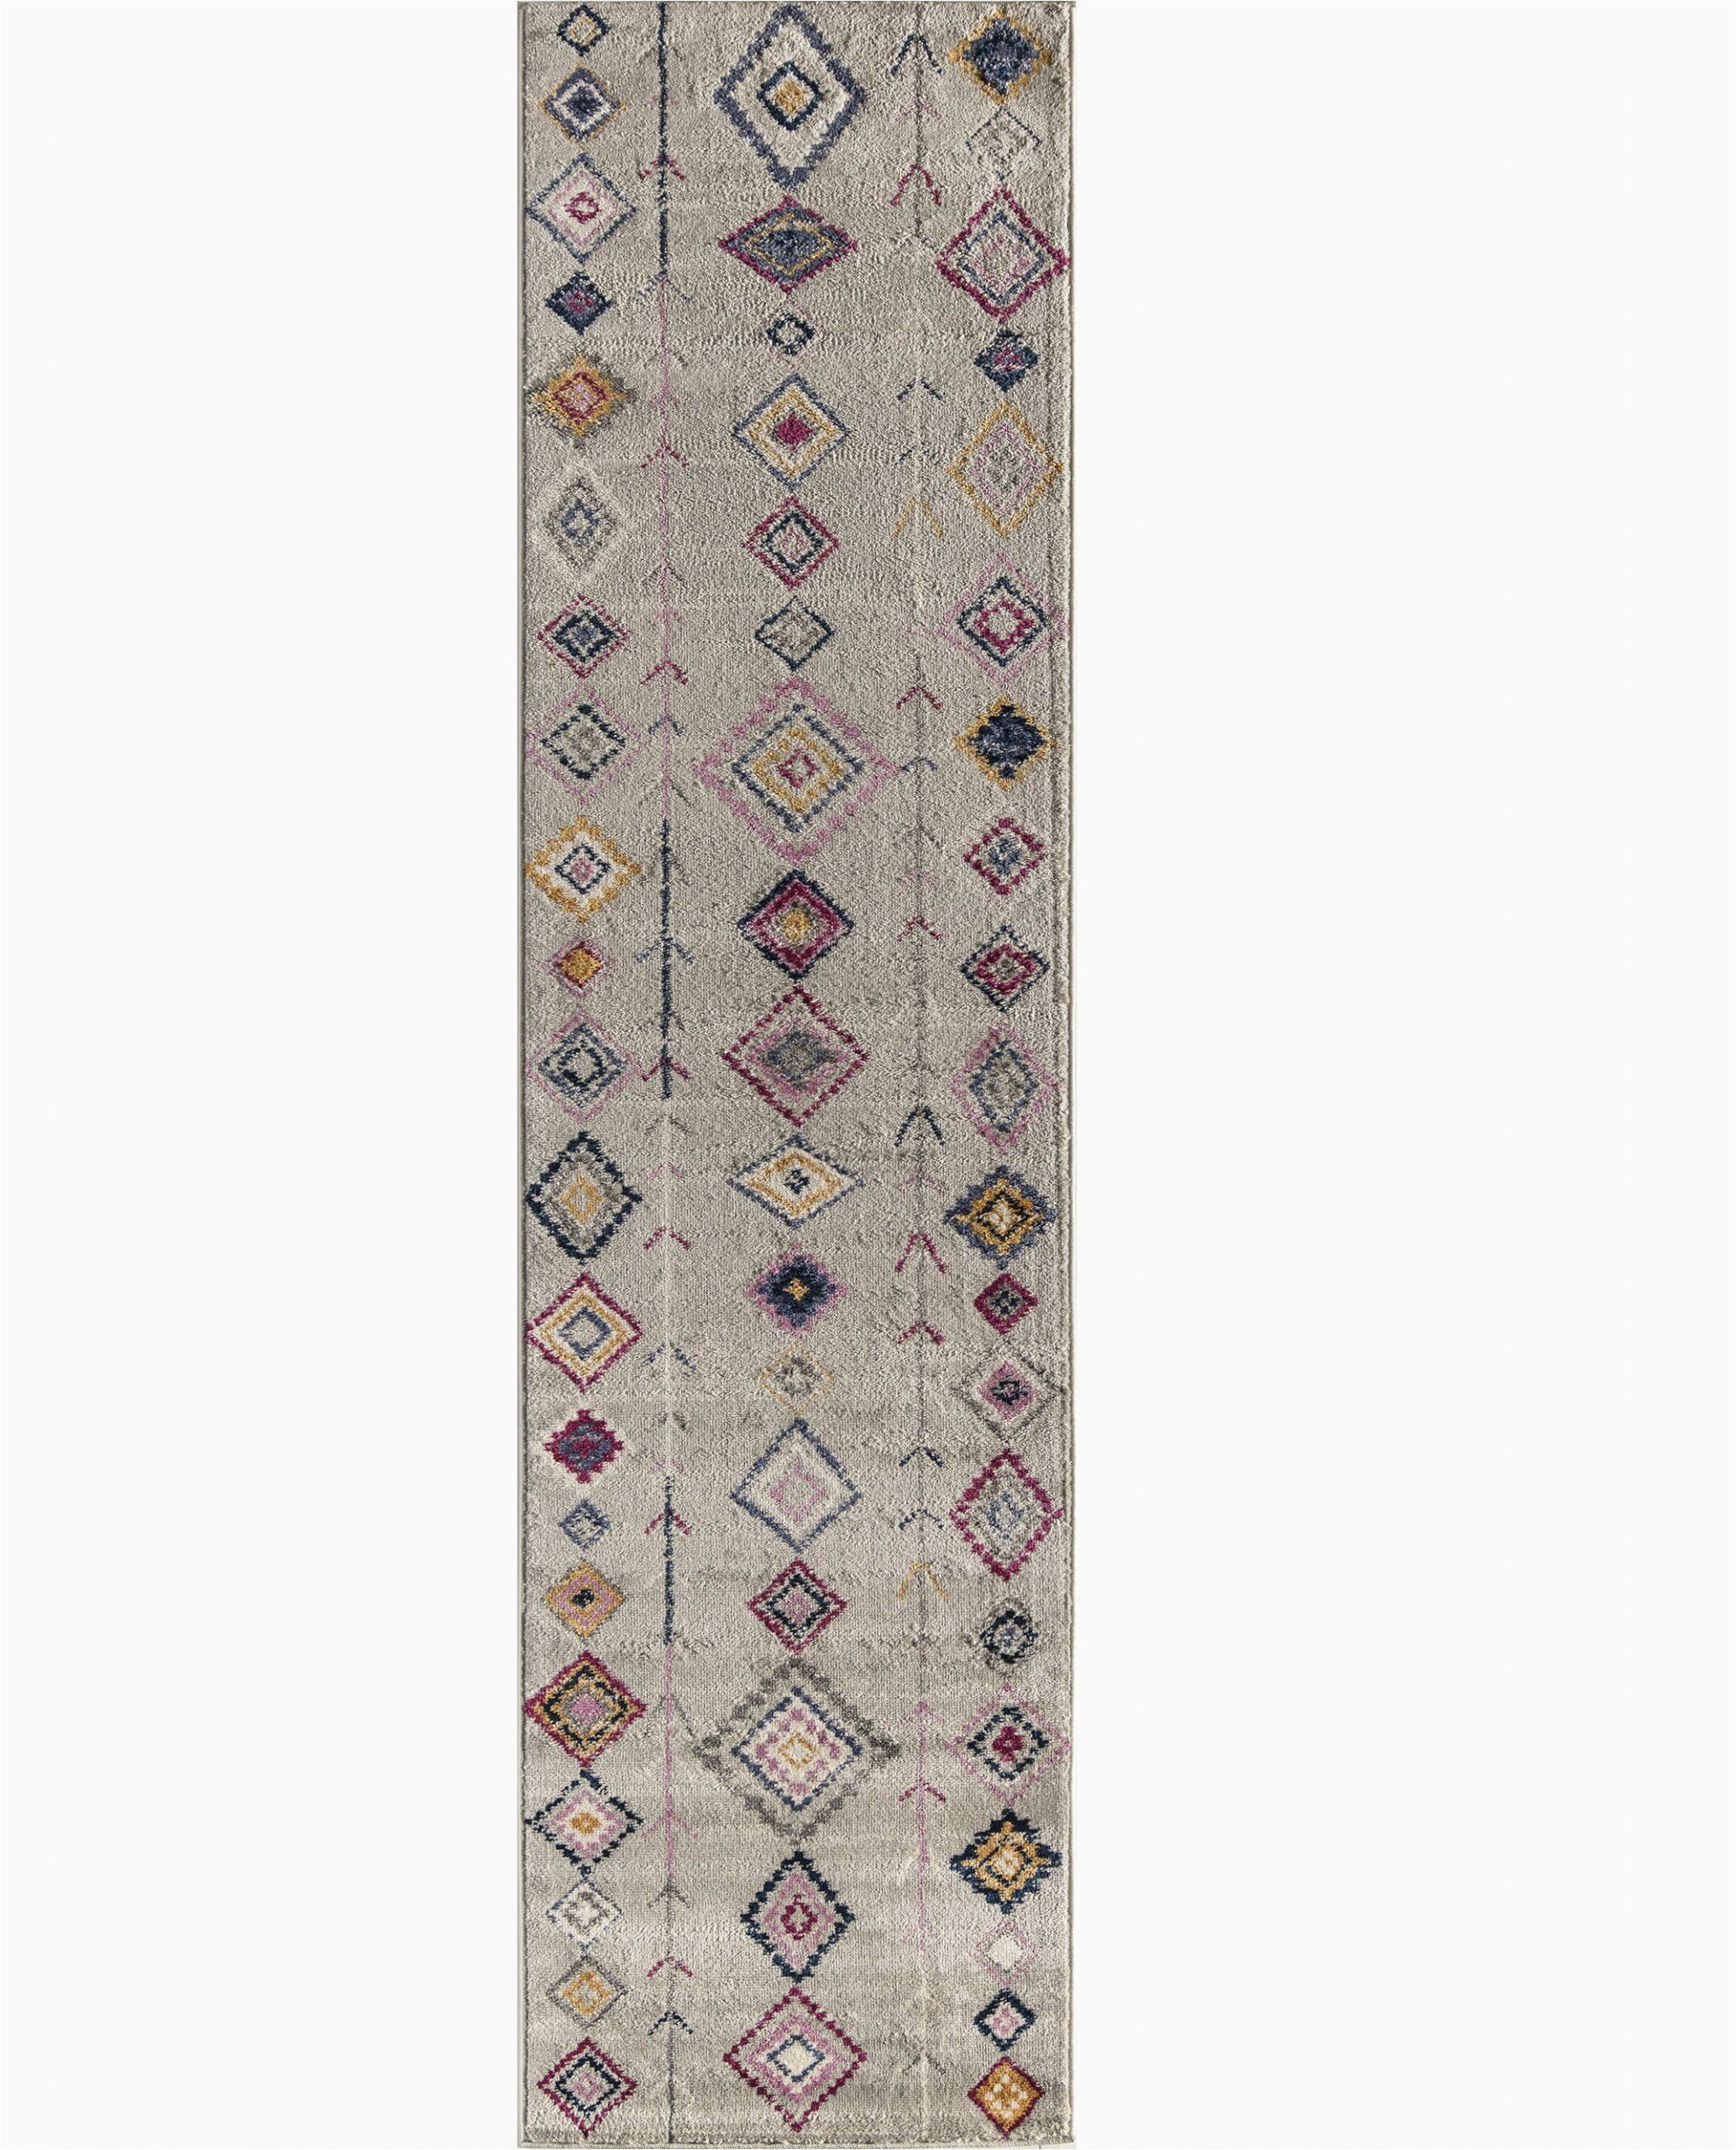 southwestern light gray area rug cogl2766 piid=